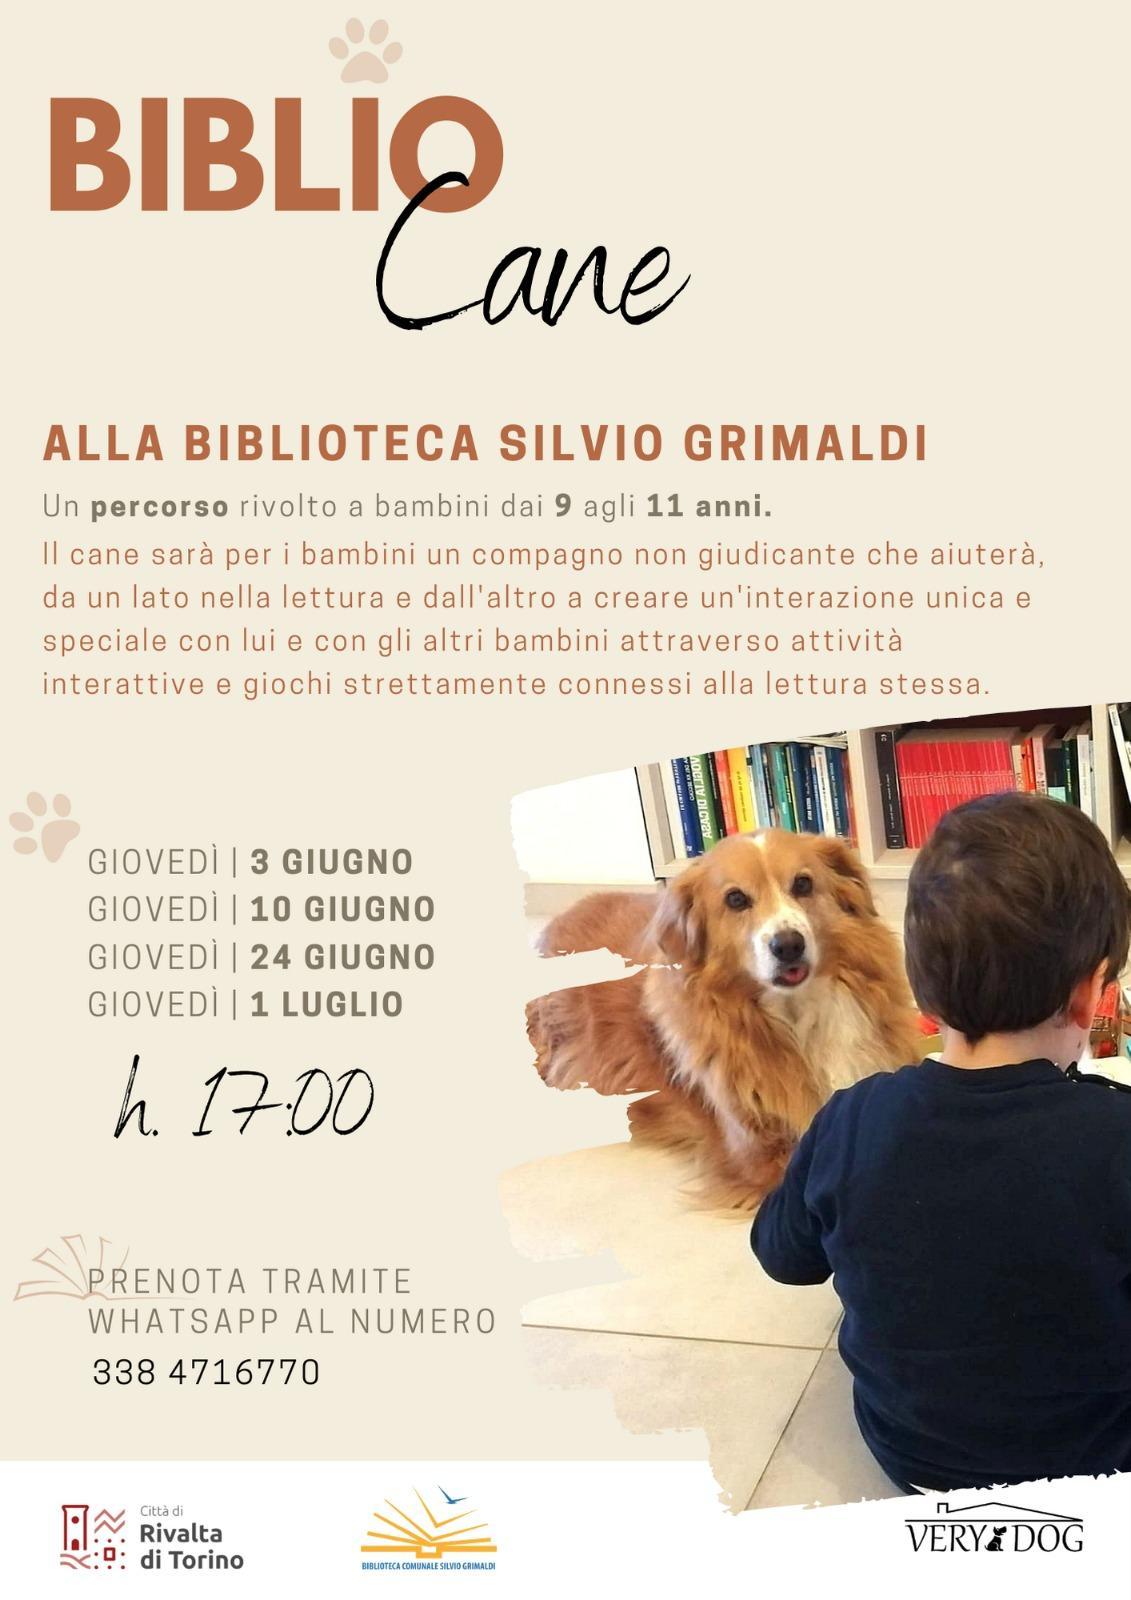 Biblio Cane